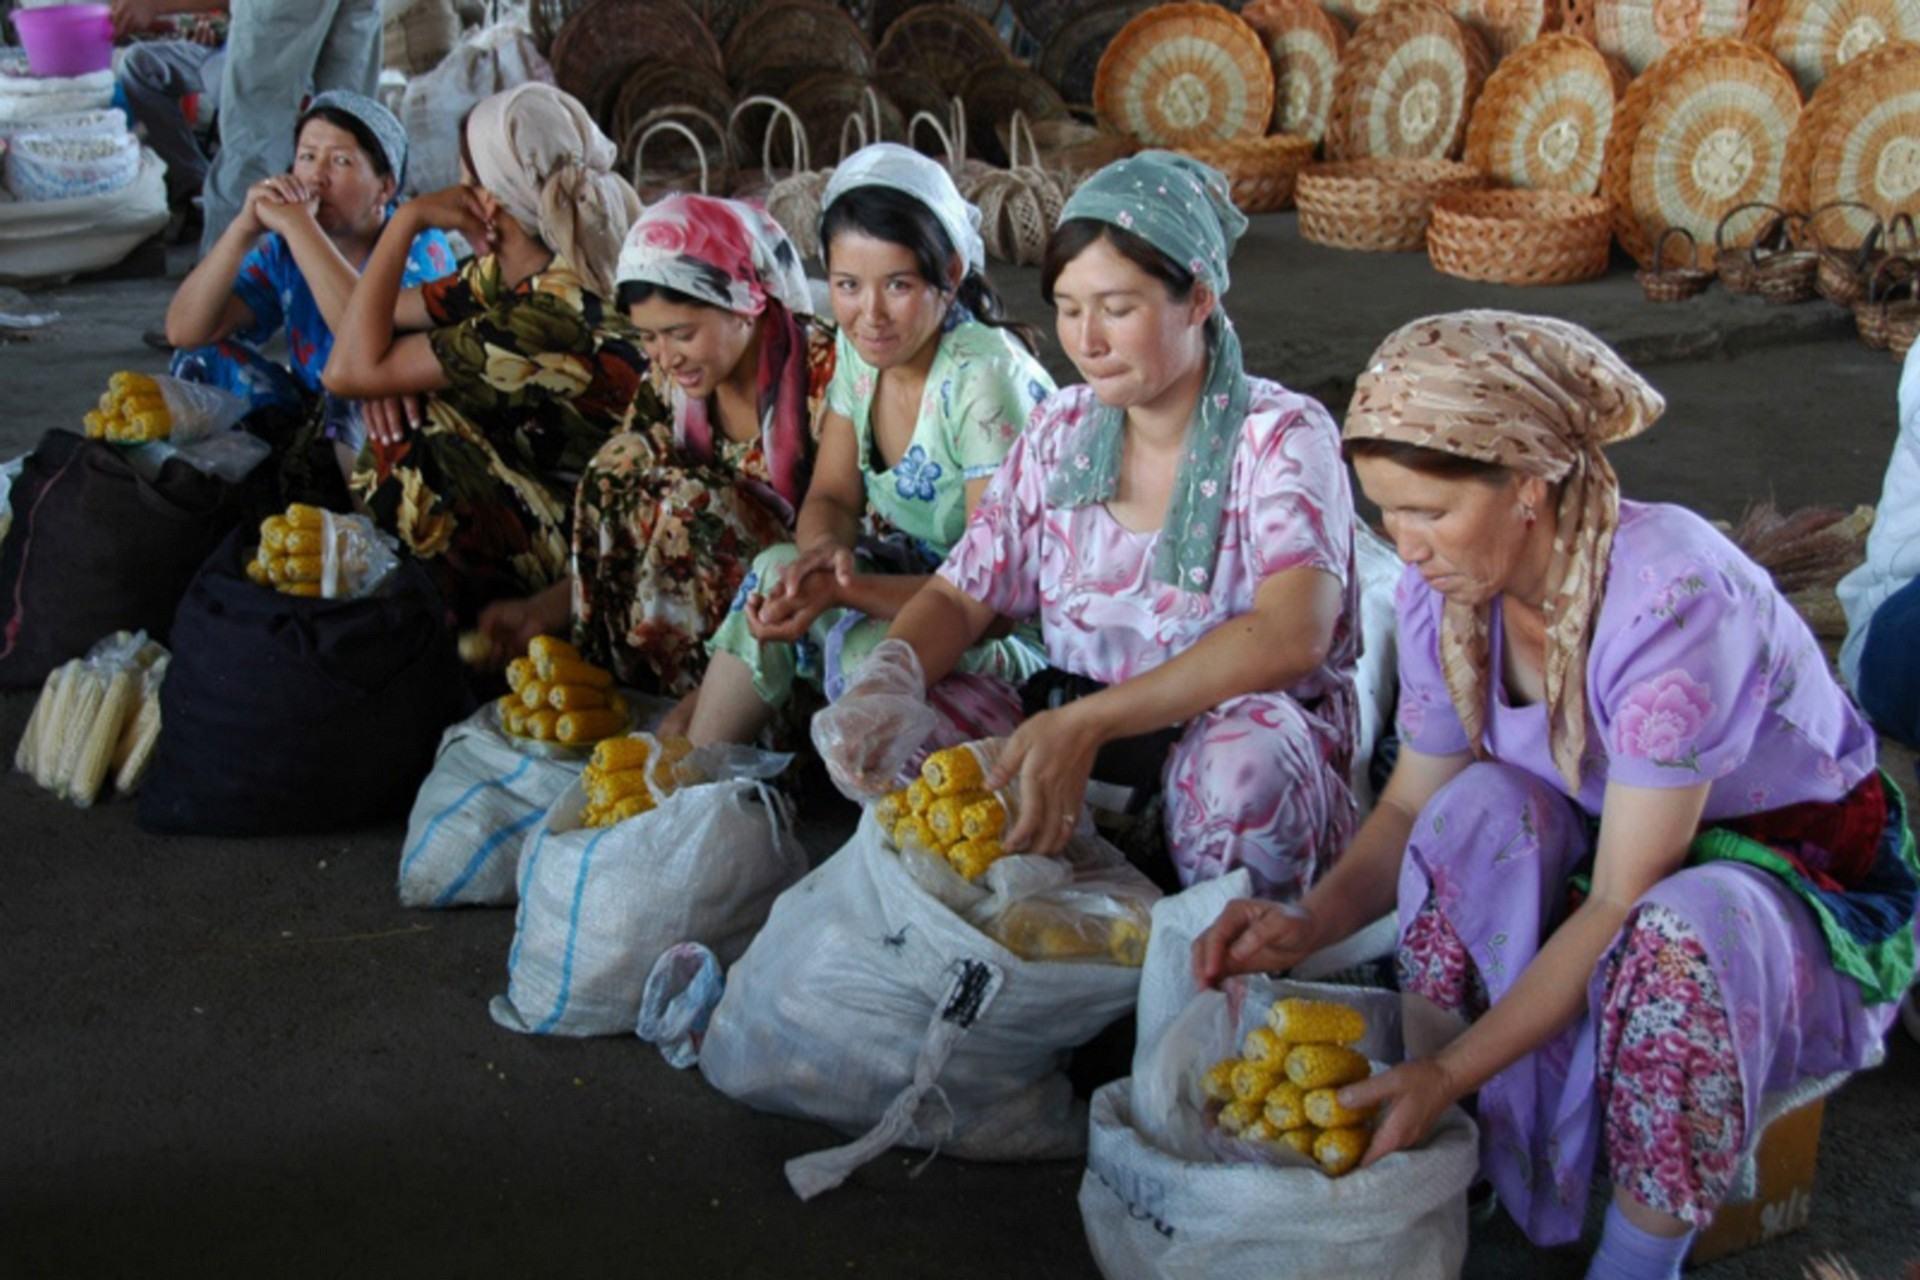 Les grands sofas d'Asie centrale: Samarcande